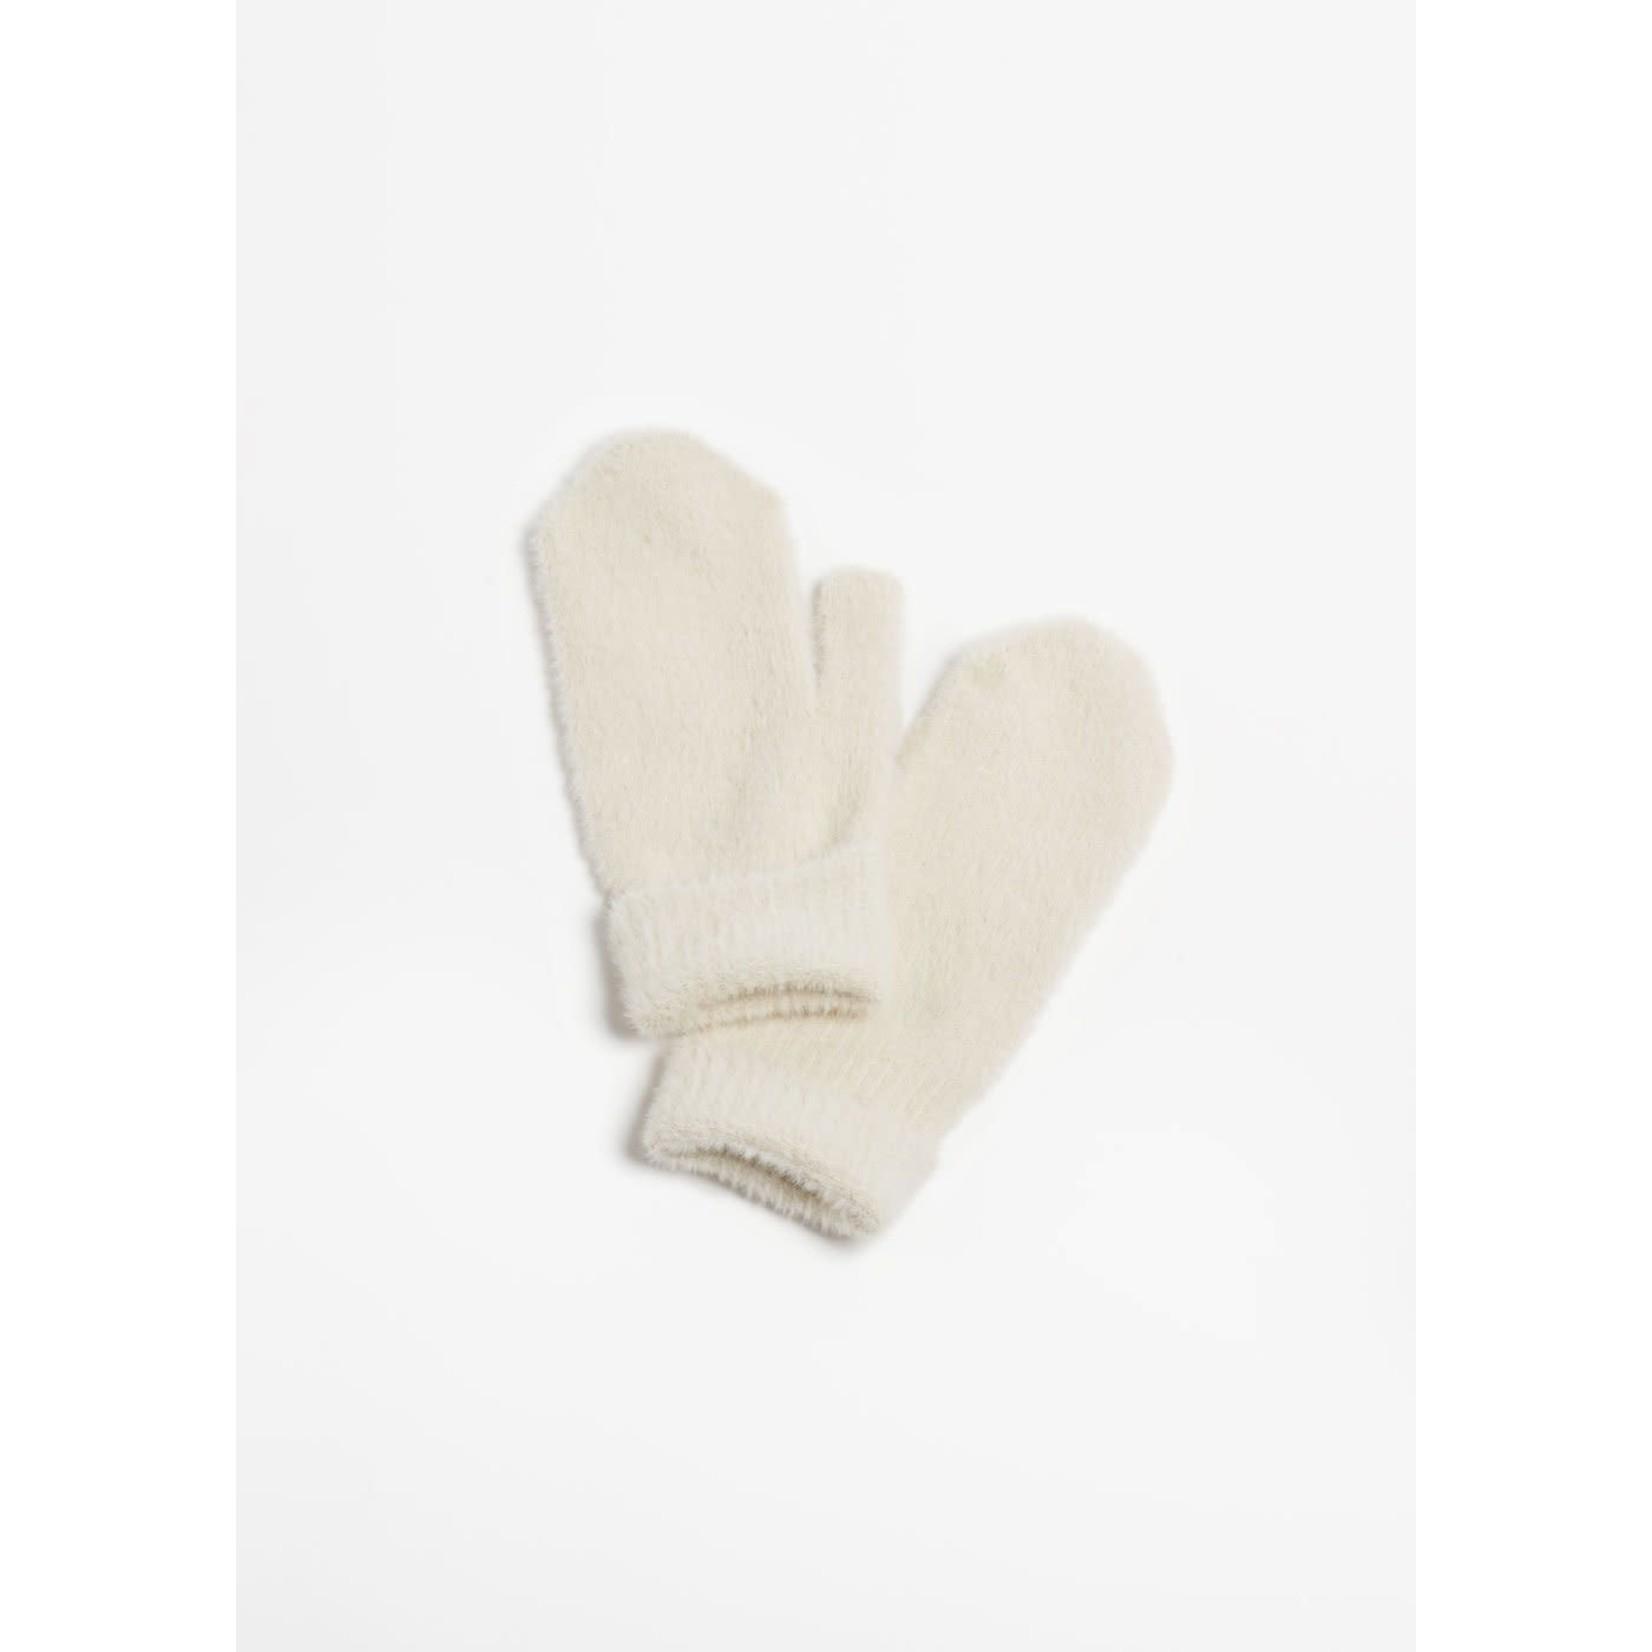 Angora Basic Mittens in Ivory